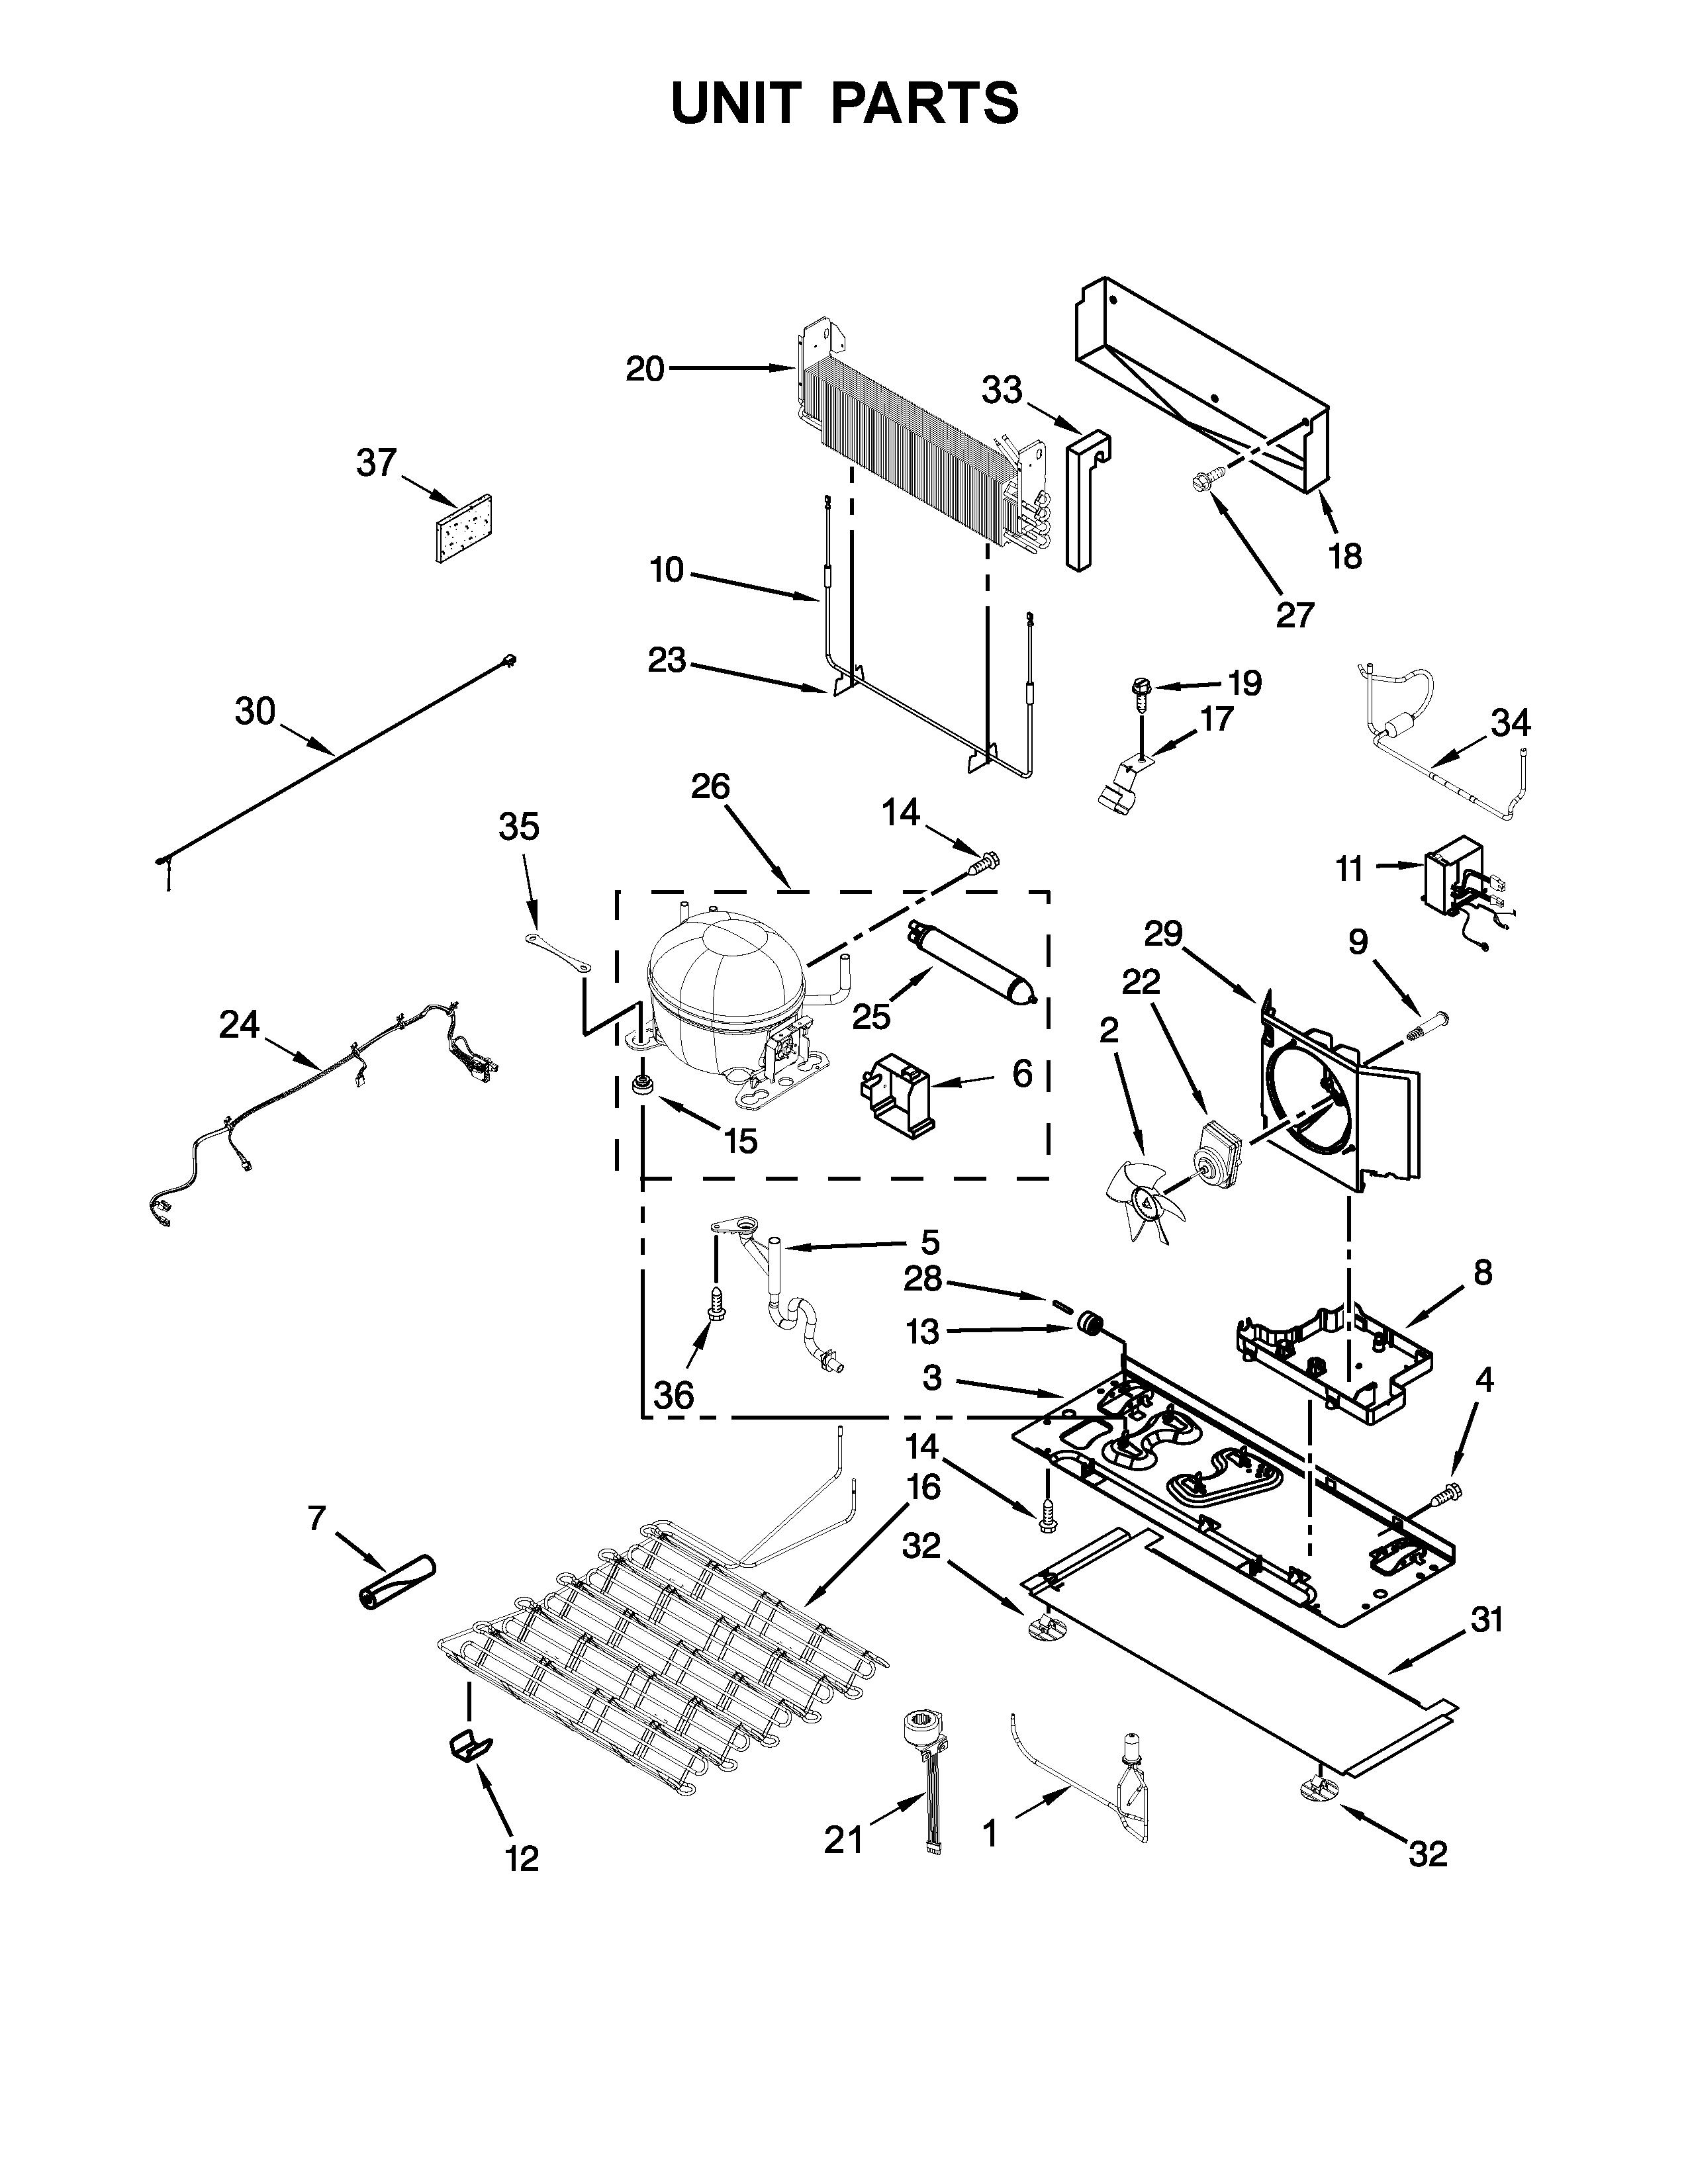 Kitchenaid  Refrigerator  Unit parts